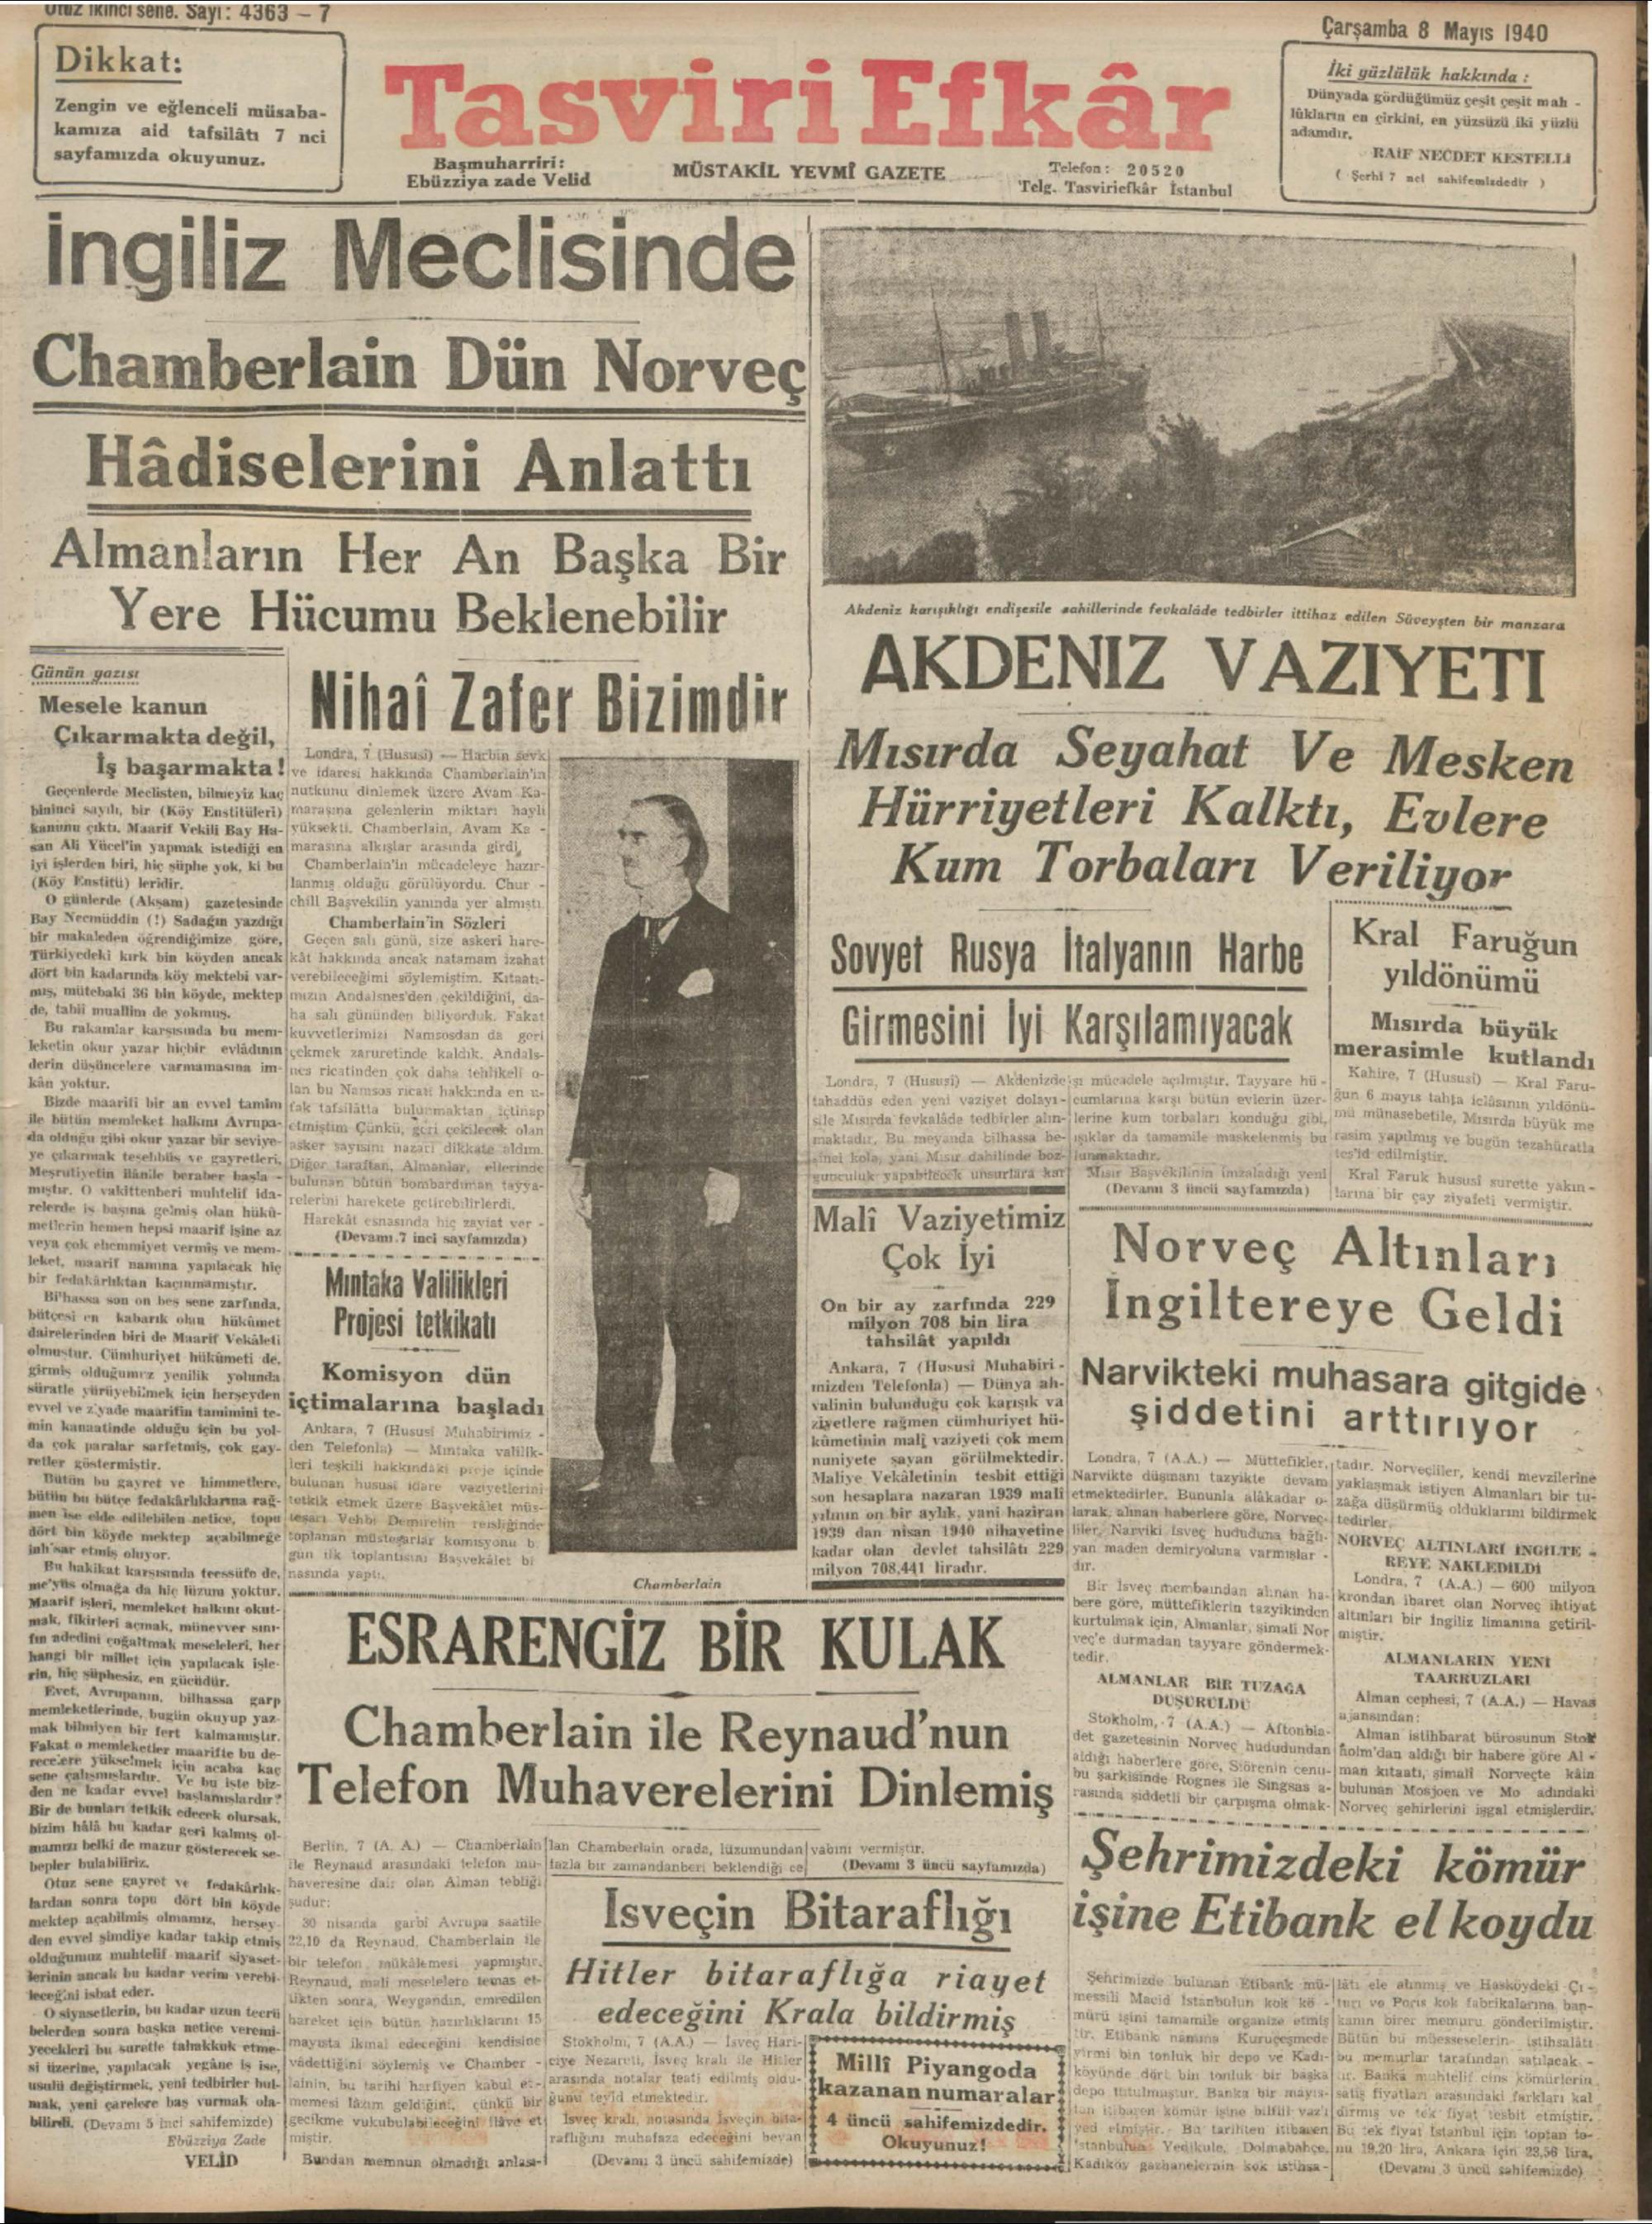 8 Mayıs 1940 Tarihli Tasviri Efkar Gazetesi Sayfa 1